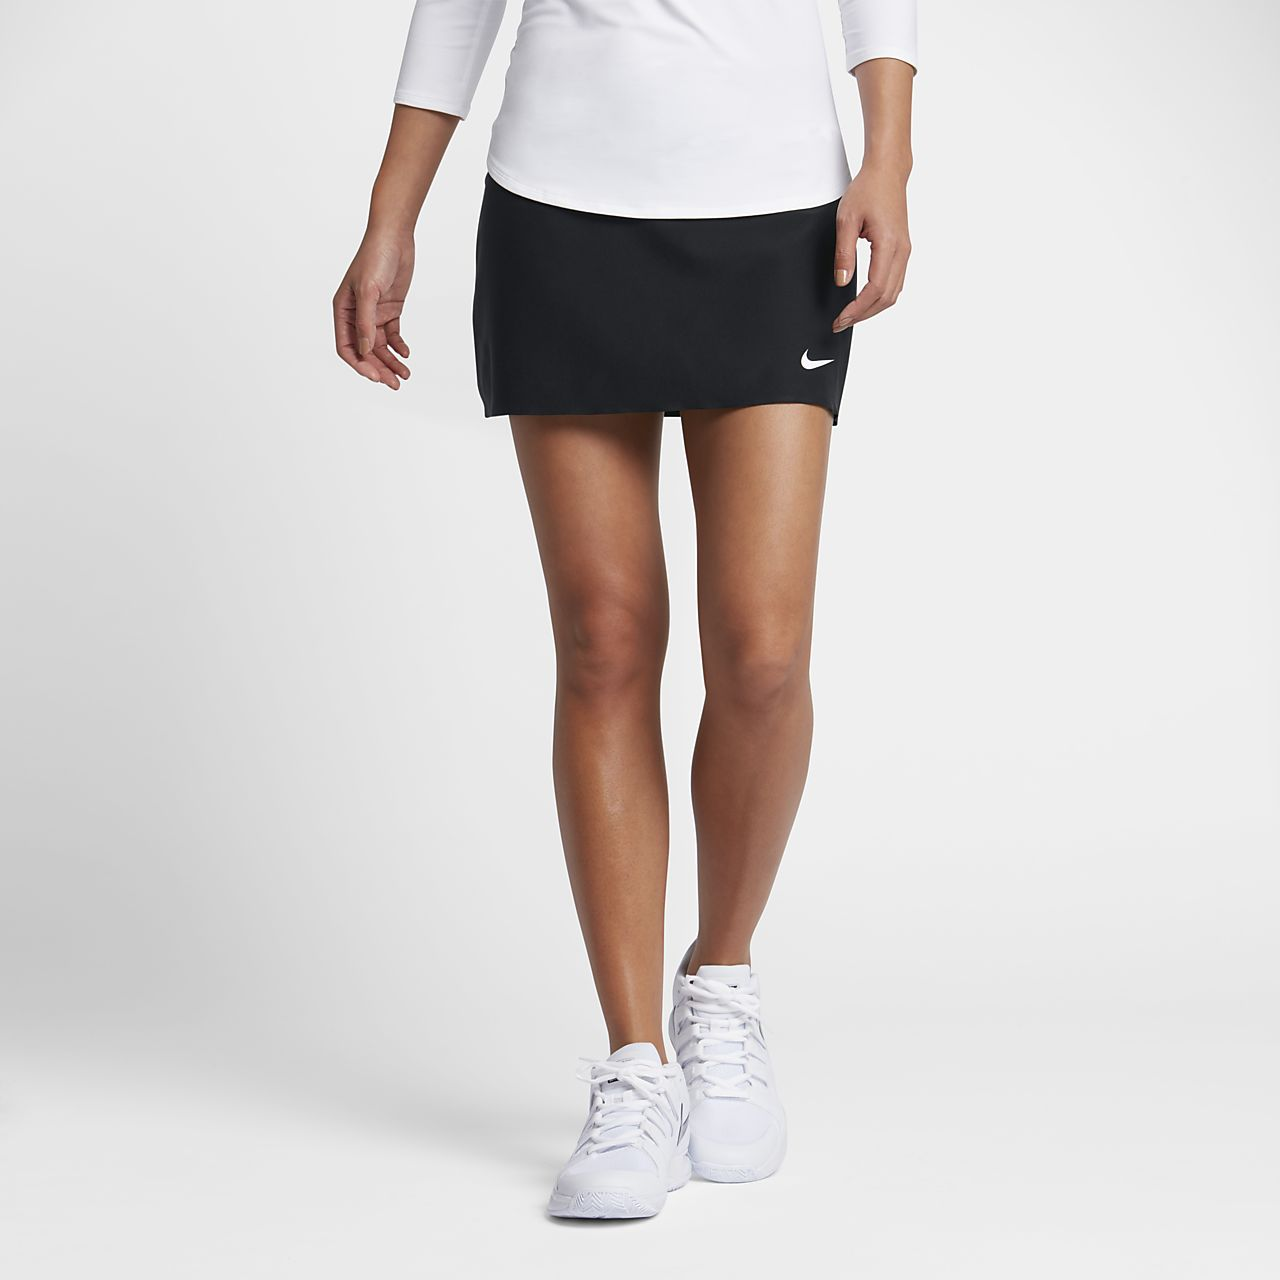 ... NikeCourt Power Spin Women's Tennis Skirt